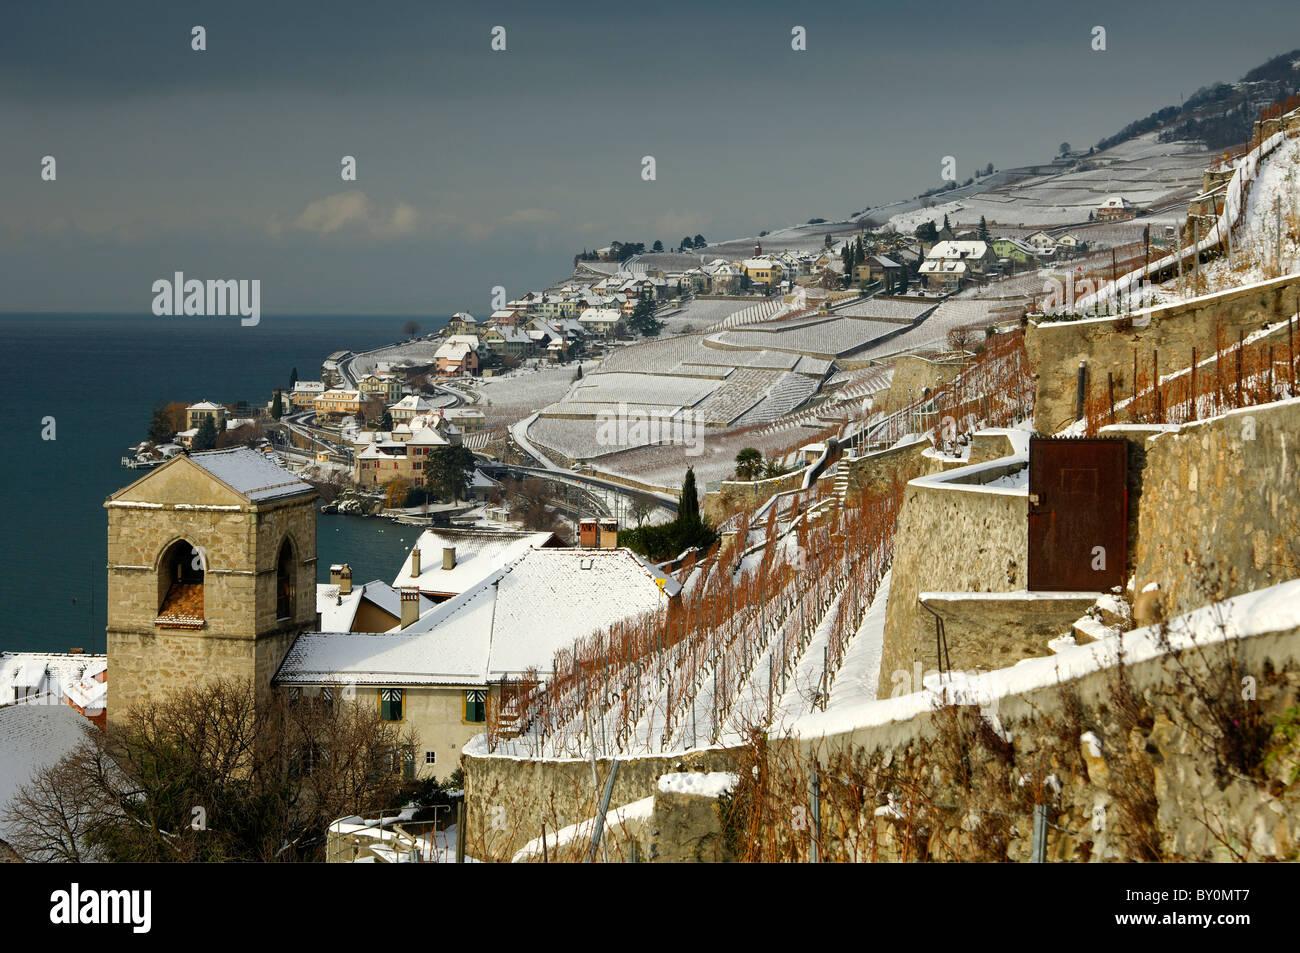 Snow-covered vineyards along Lake Geneva, Lac Leman, in the UNESCO World Heritage site Lavaux, Saint-Saphorin, Switzerland - Stock Image